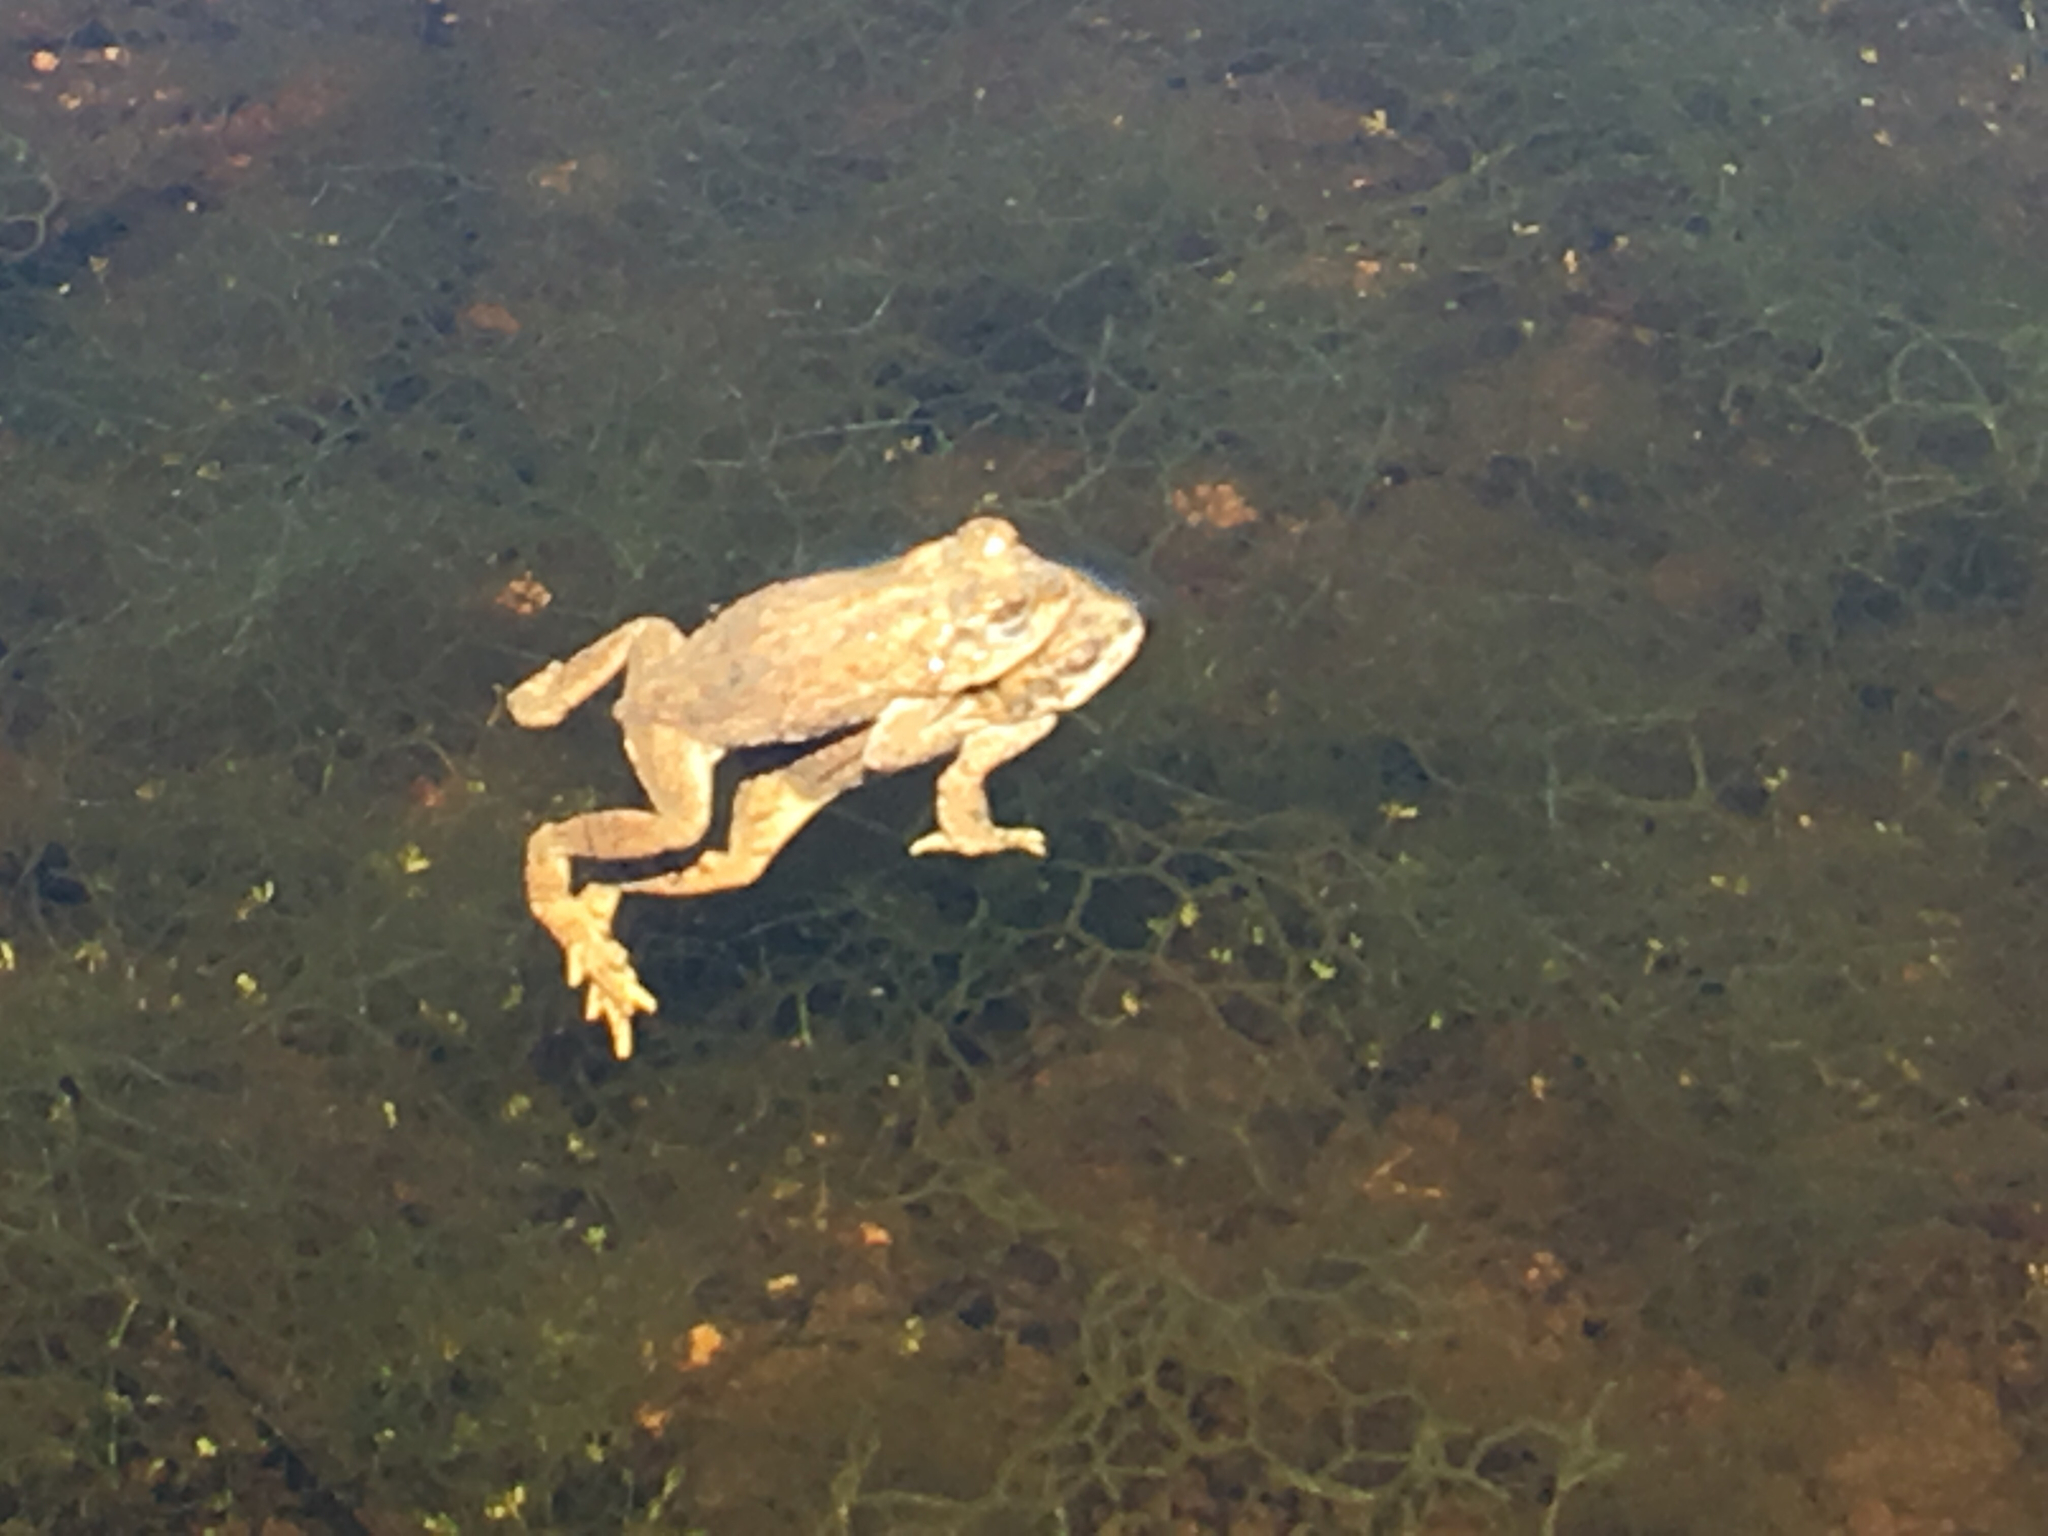 North american toads